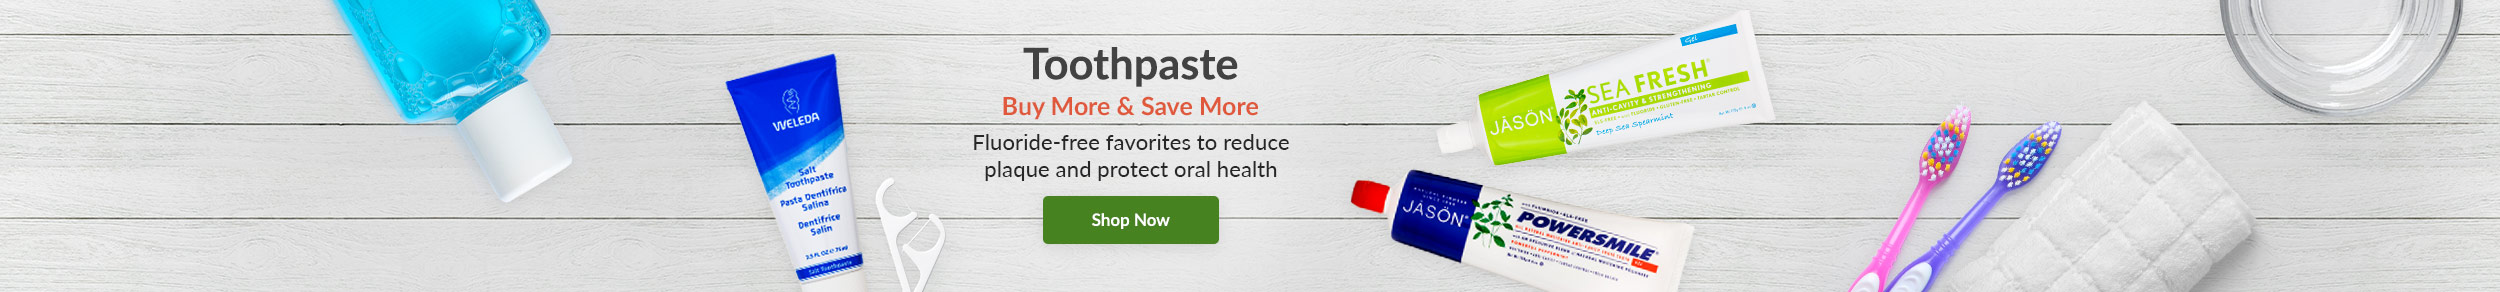 https://i3.pureformulas.net/images/static/Toothpaste-Essentials_Beauty-1_092118.jpg